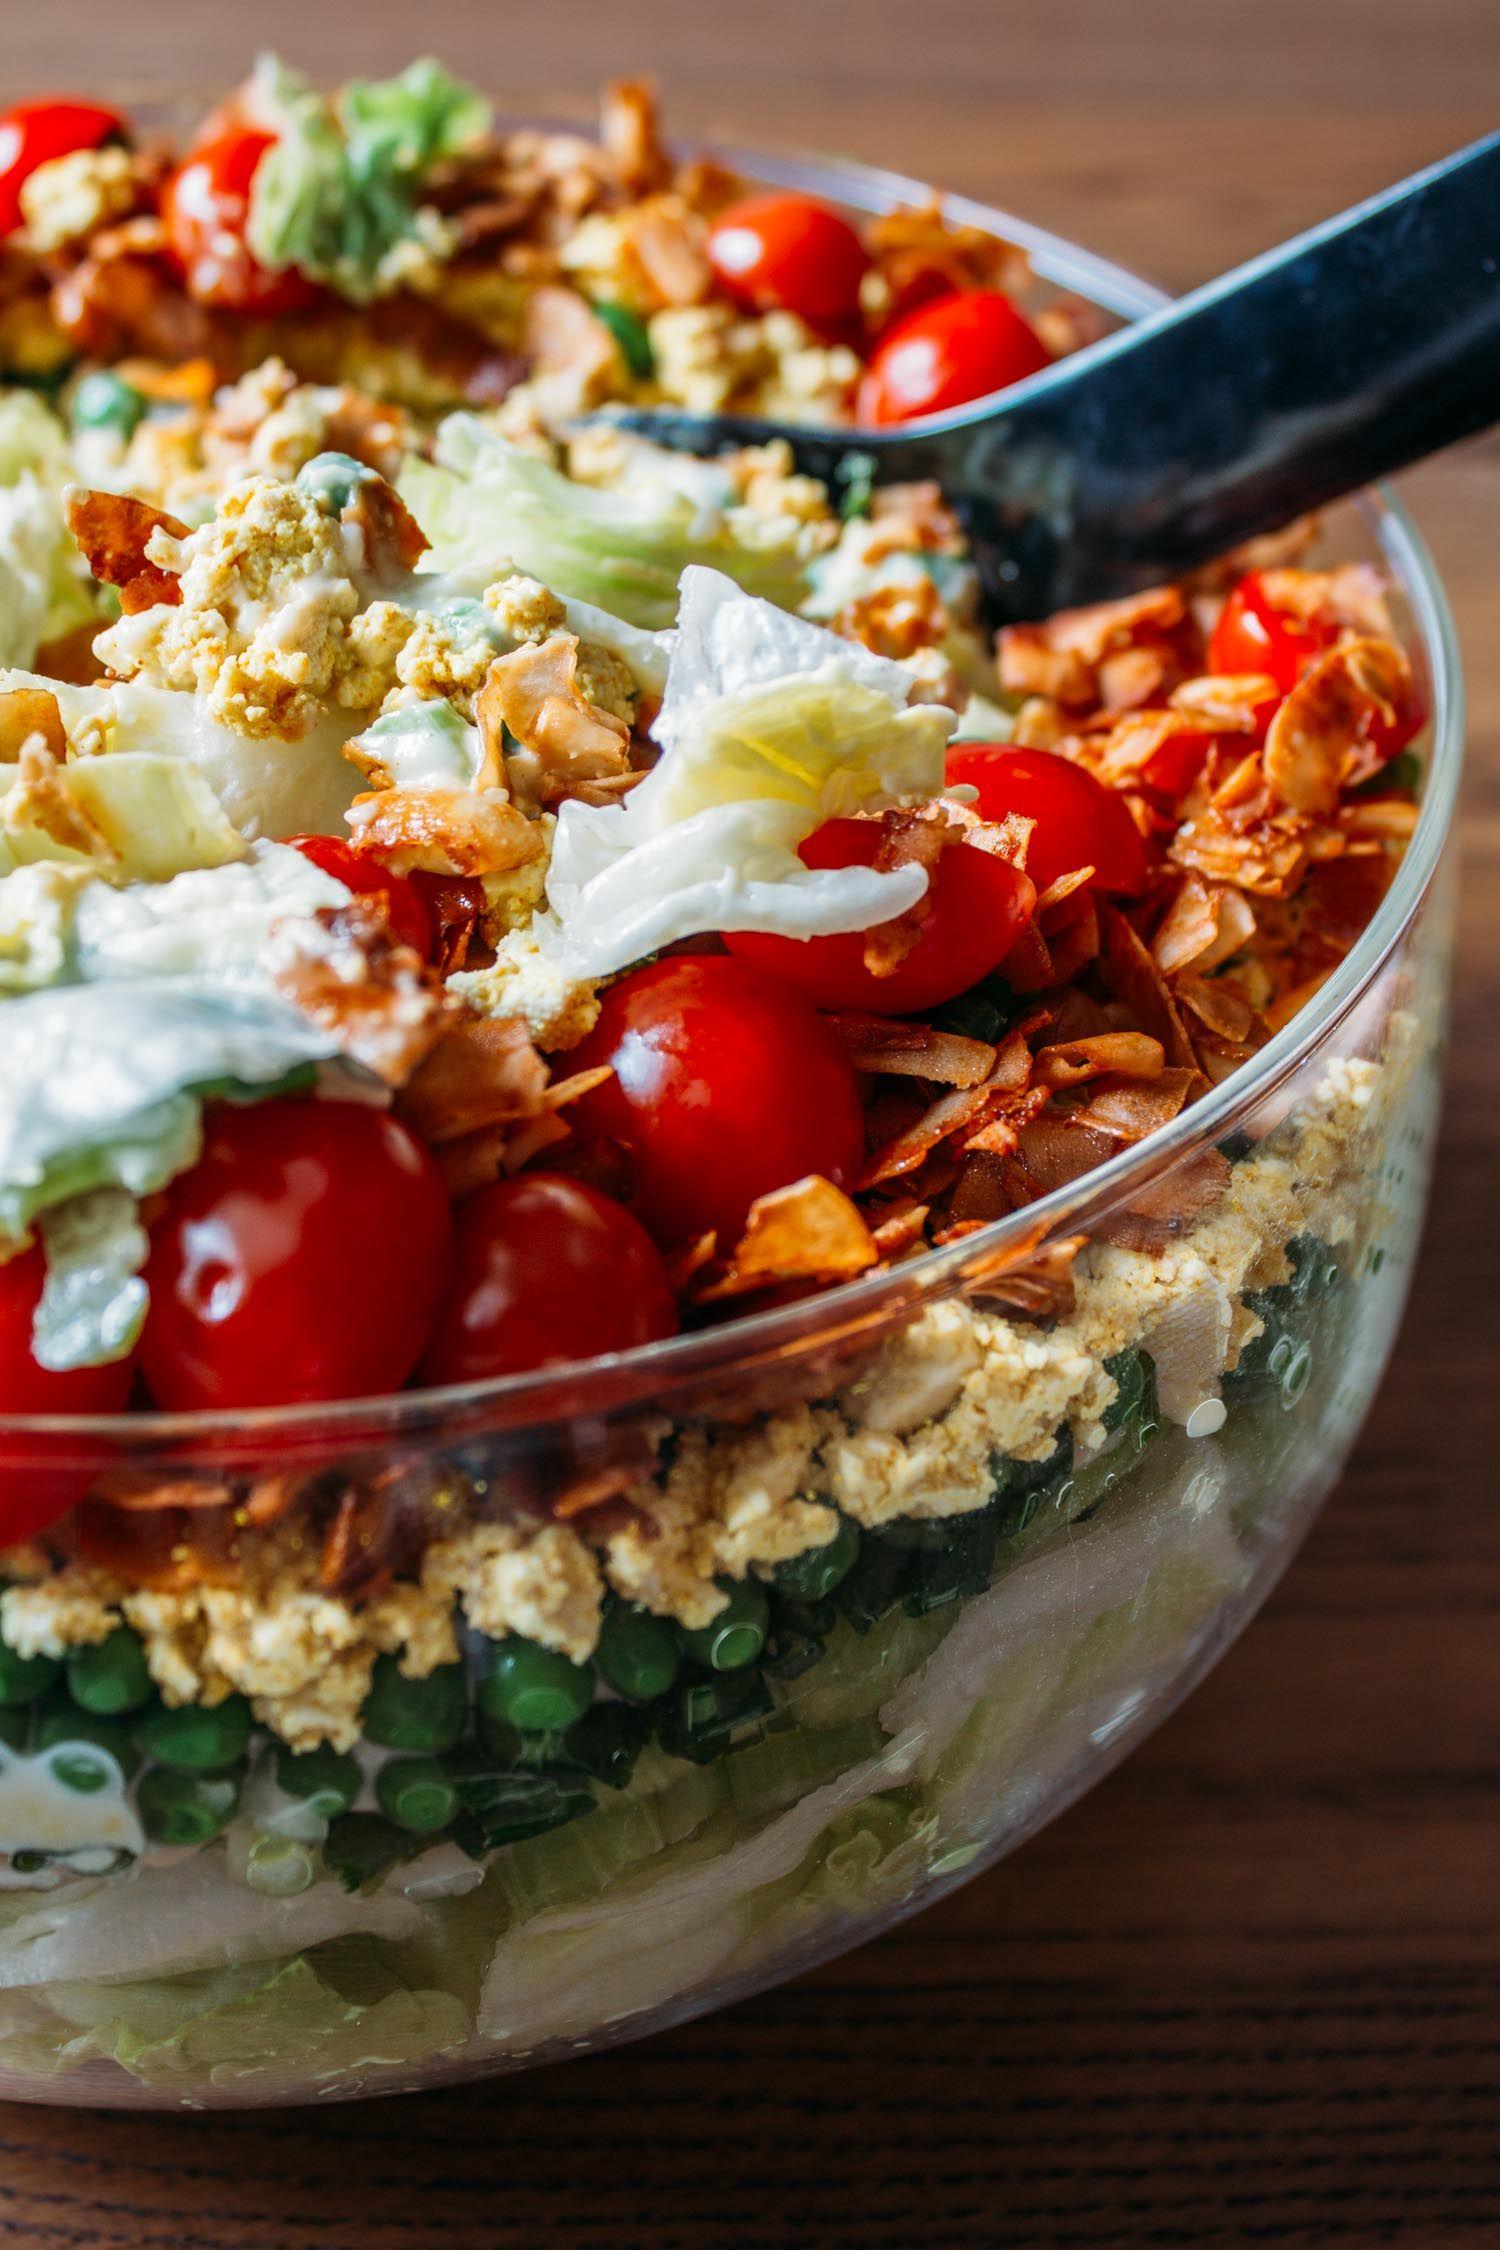 Vegan 7 Layer Salad Recipe Veeg Recipe Layered Salad Recipes Layered Salad 7 Layer Salad